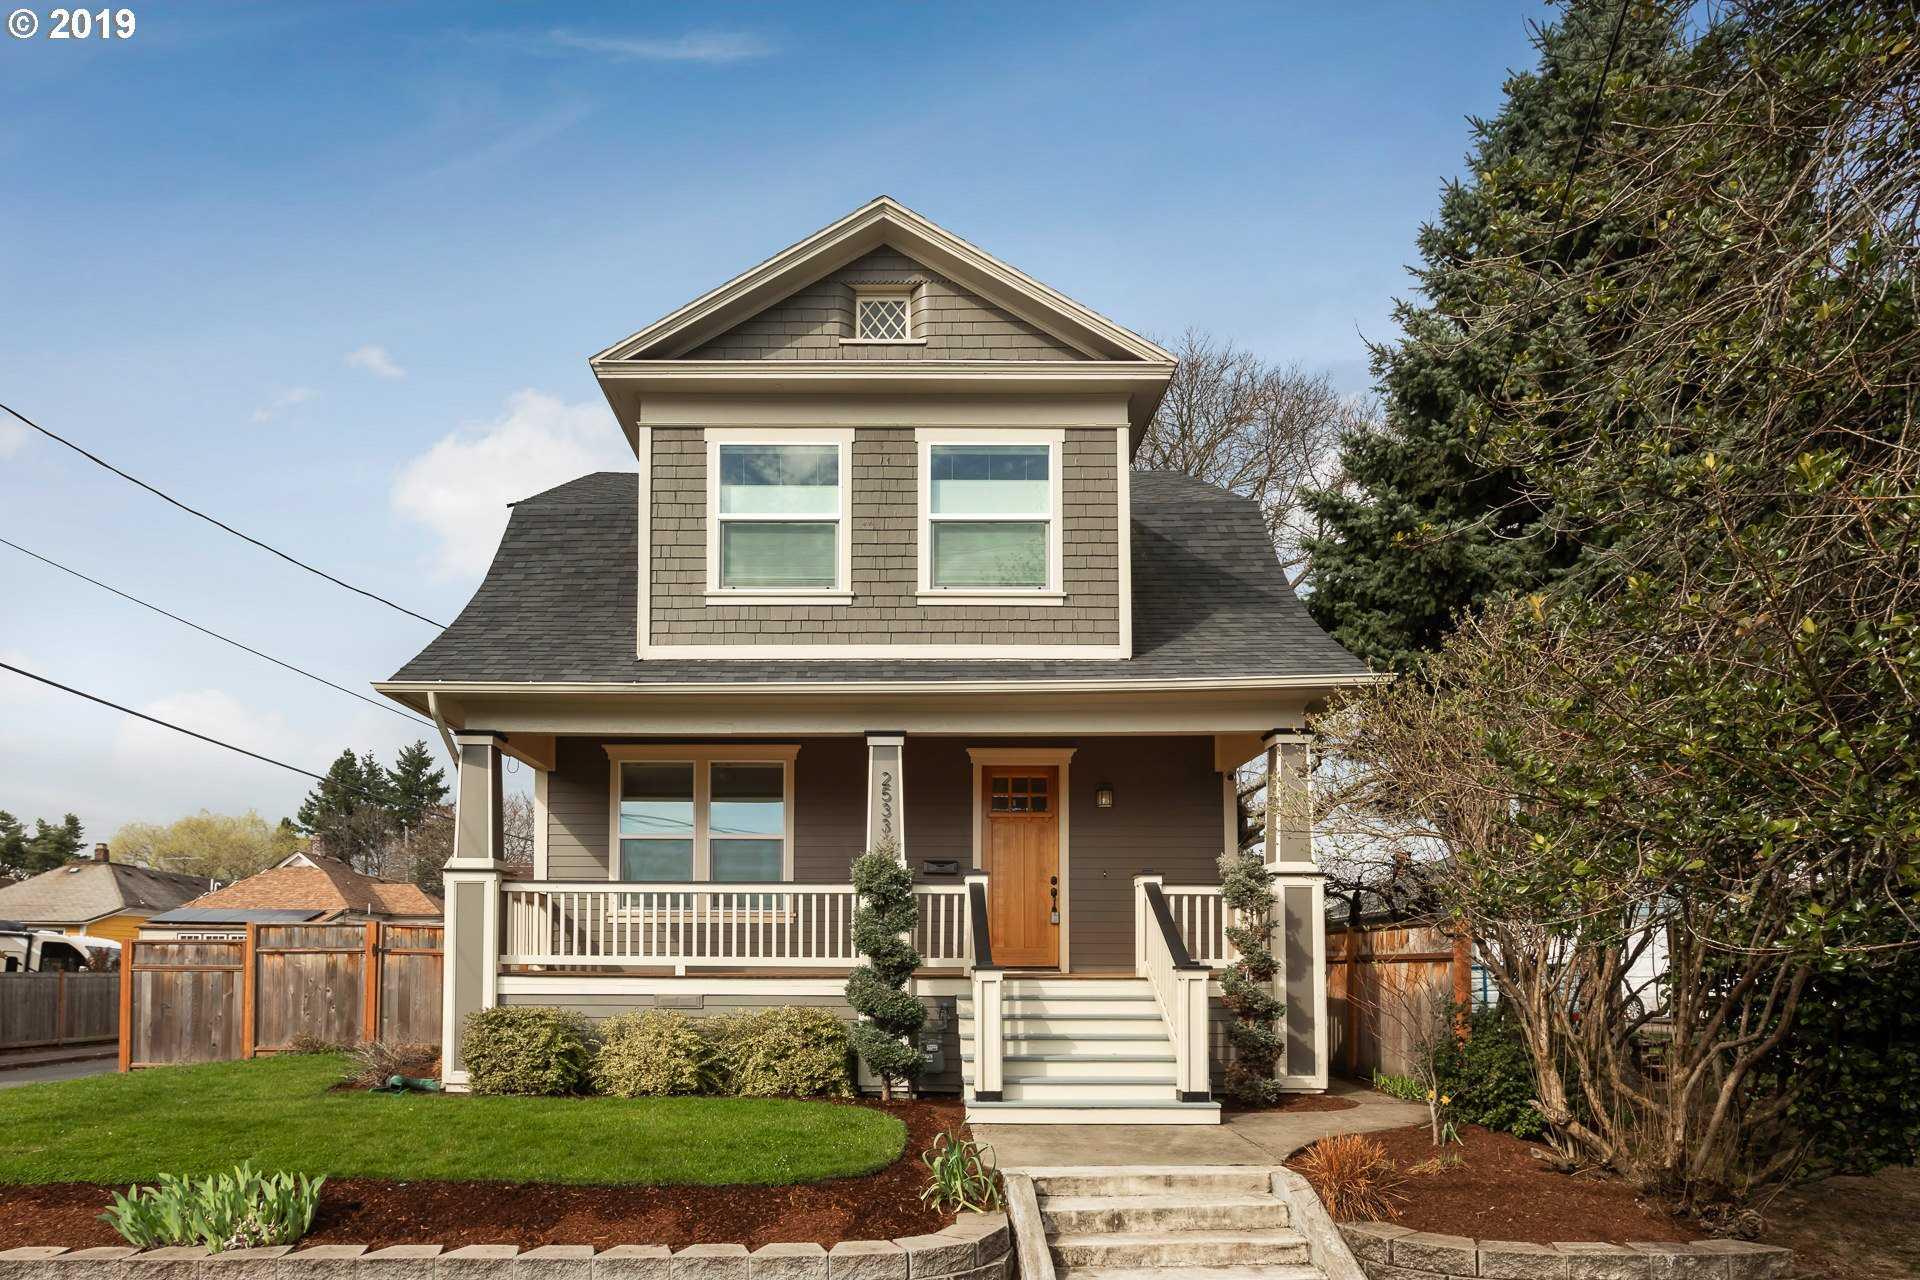 $875,000 - 4Br/3Ba -  for Sale in Division/ Clinton, Portland